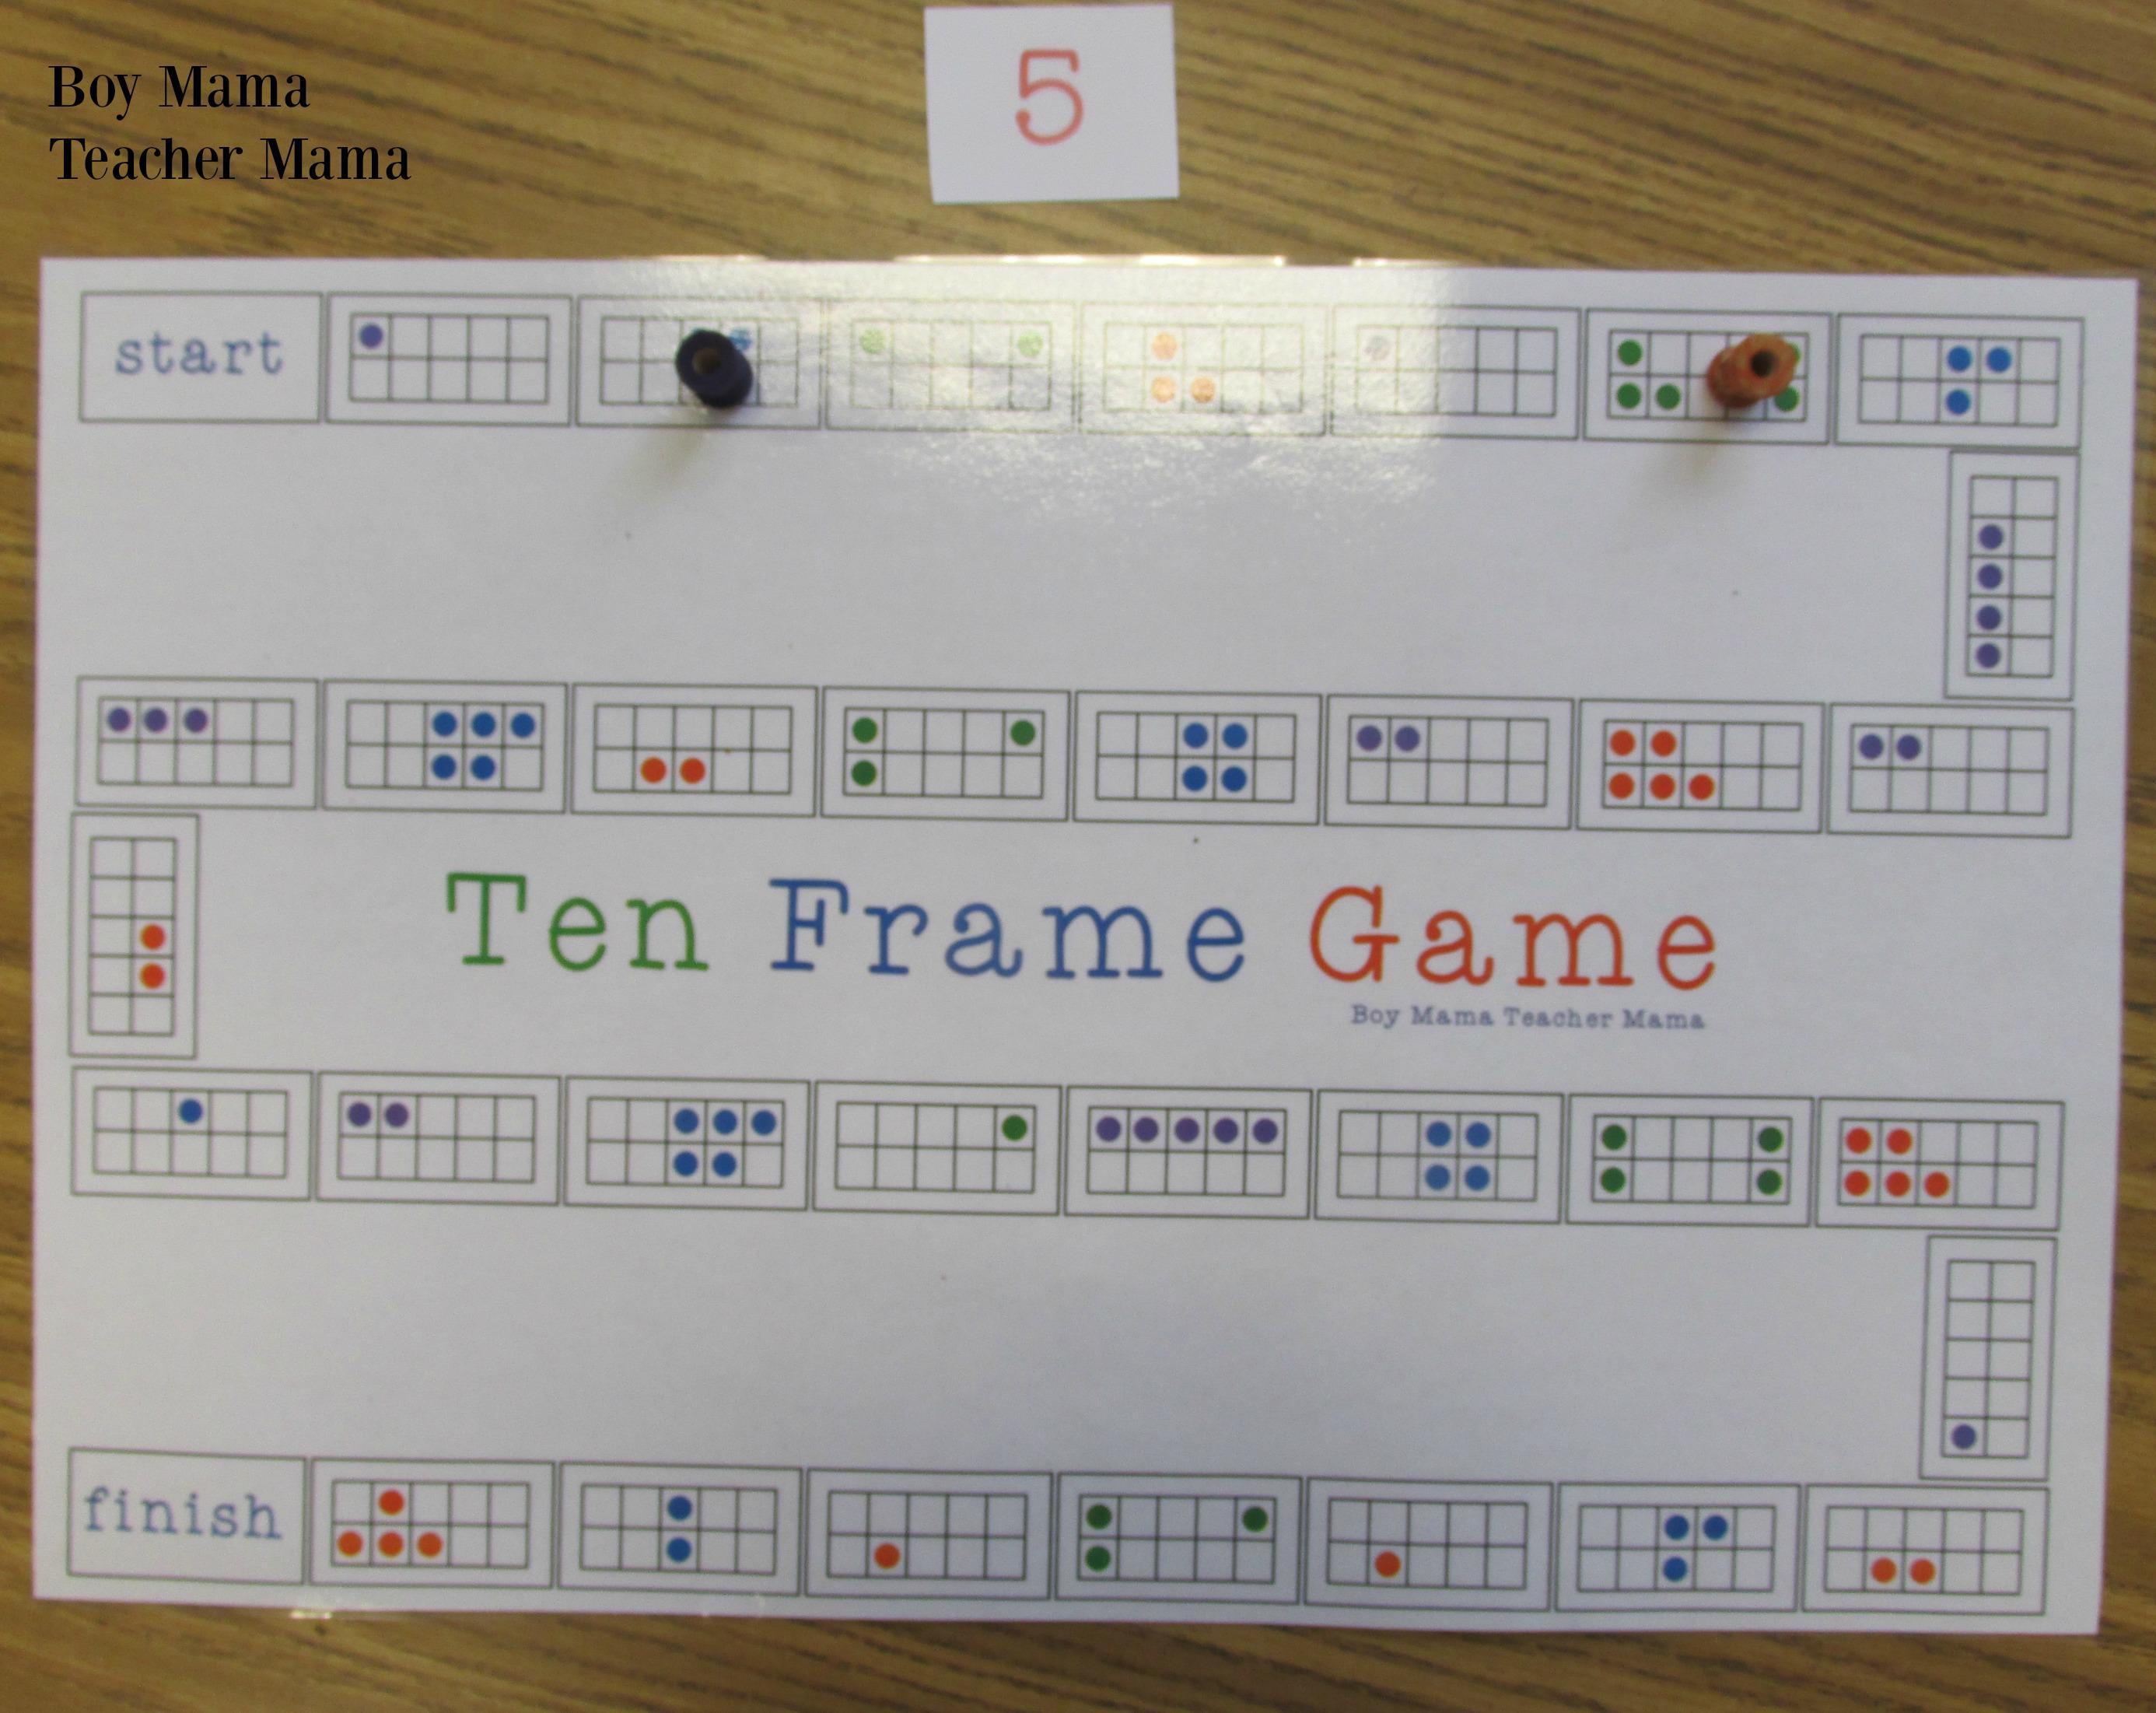 Boy Mama Teacher Mama Ten Frame Game 2